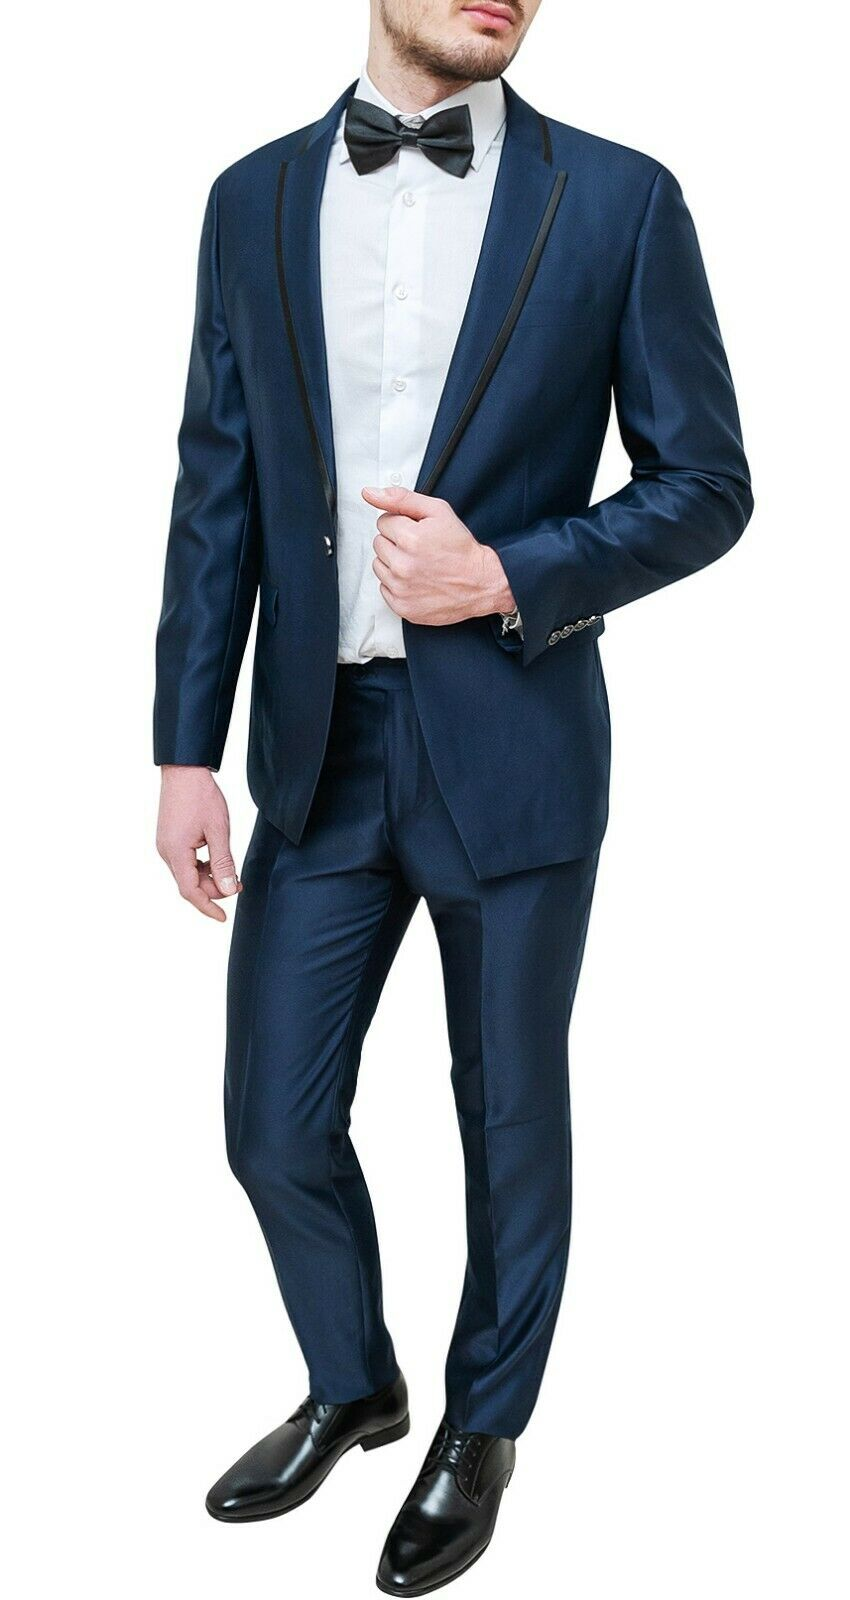 Elegante abito uomo Diamond sartoriale blu raso lucido vestito smoking  cerimonia.   631923a4baa